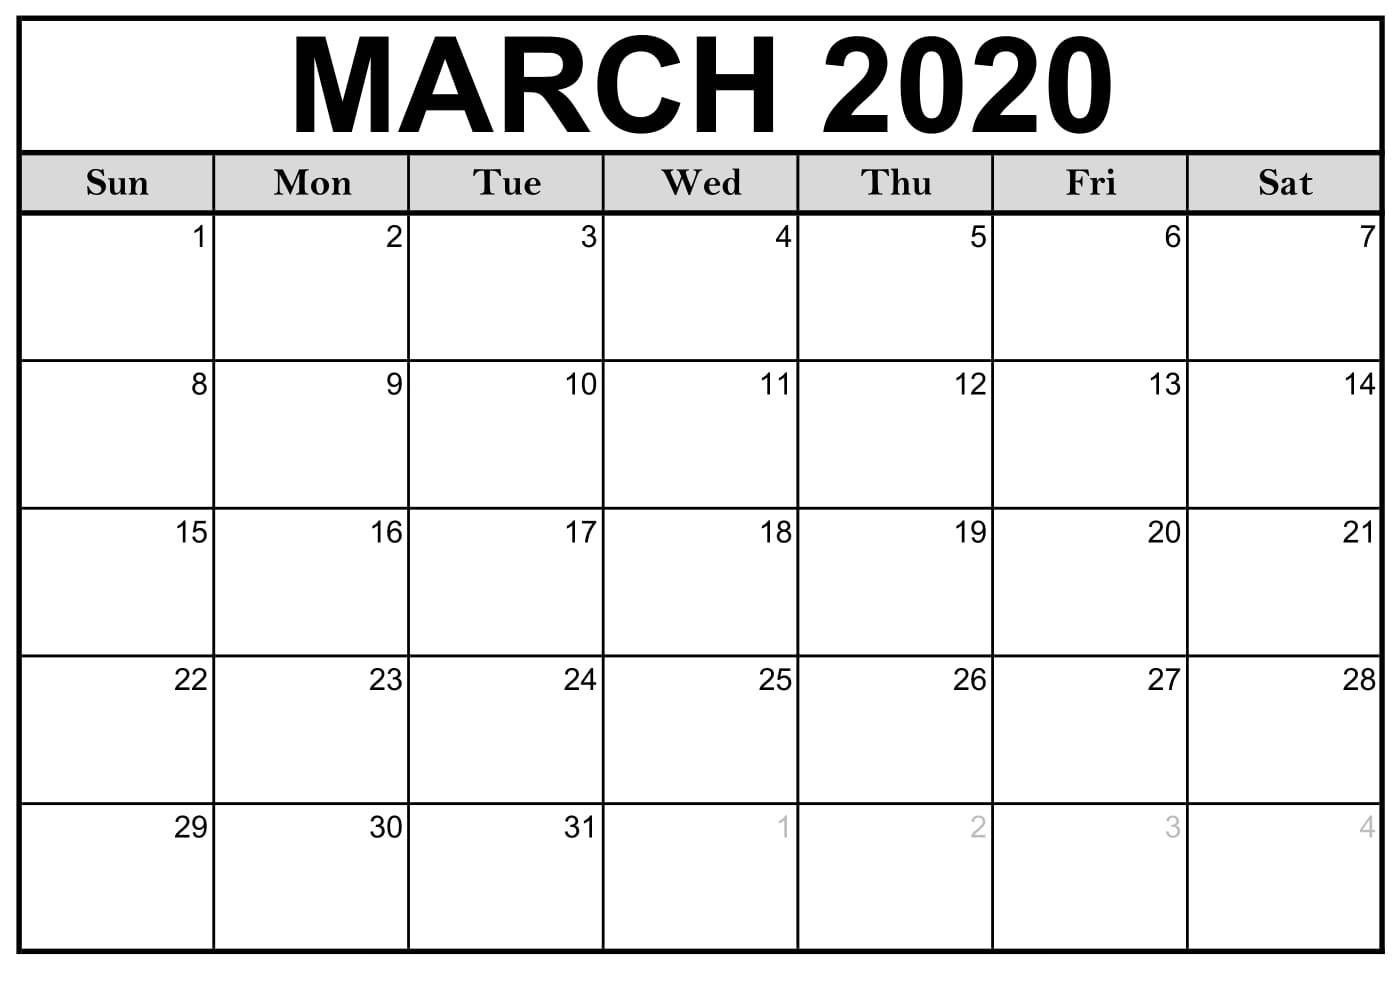 Calendar March 2020 Free Printable | Calendar Printables Calendar Template To Print Free